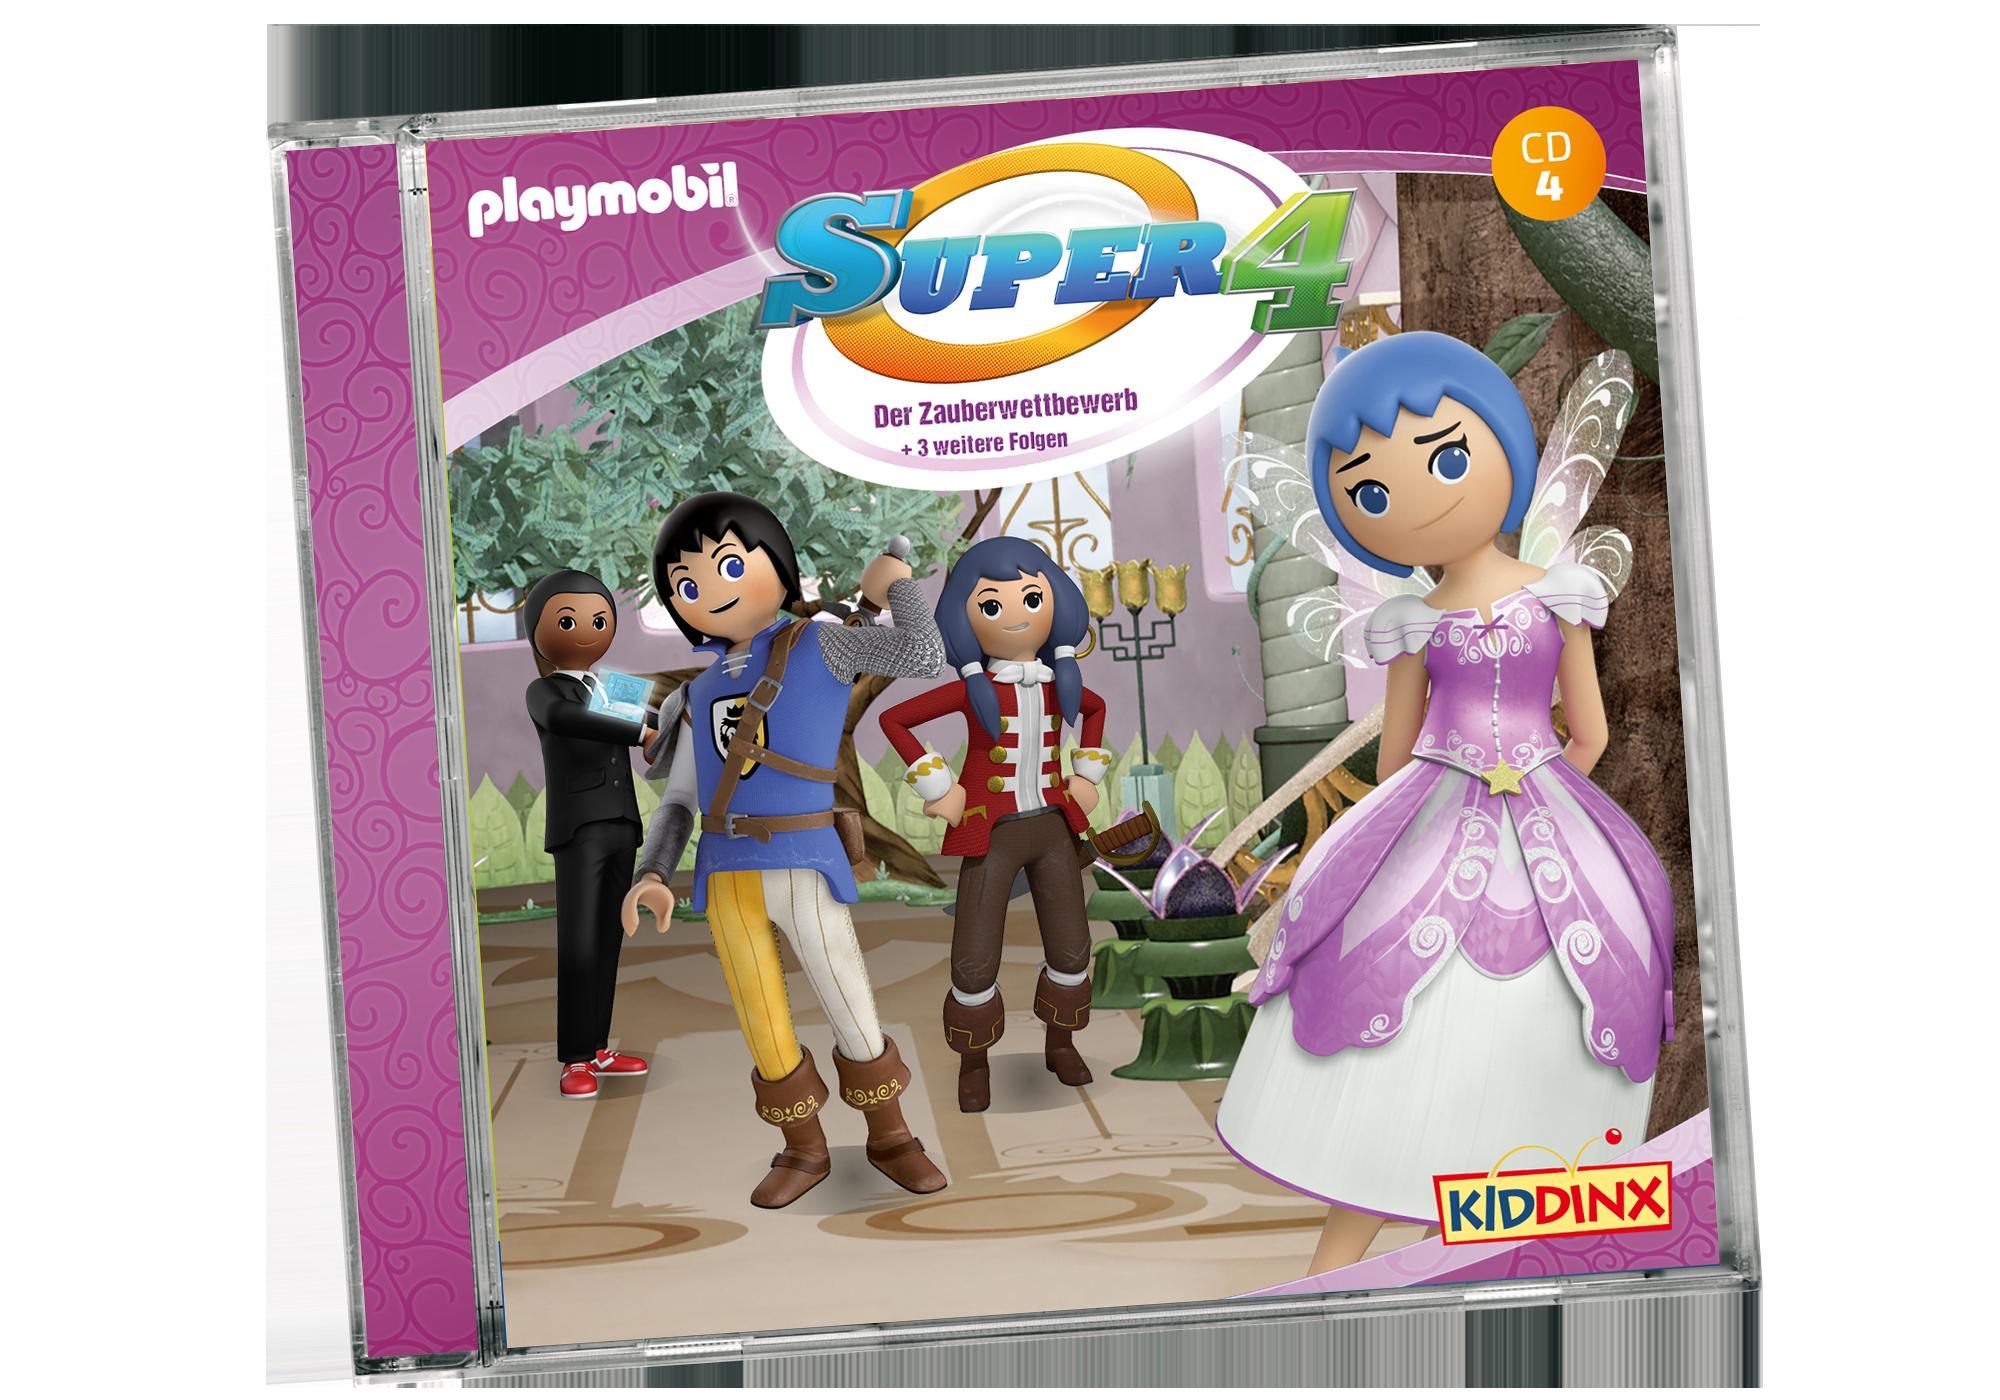 http://media.playmobil.com/i/playmobil/80016_product_detail